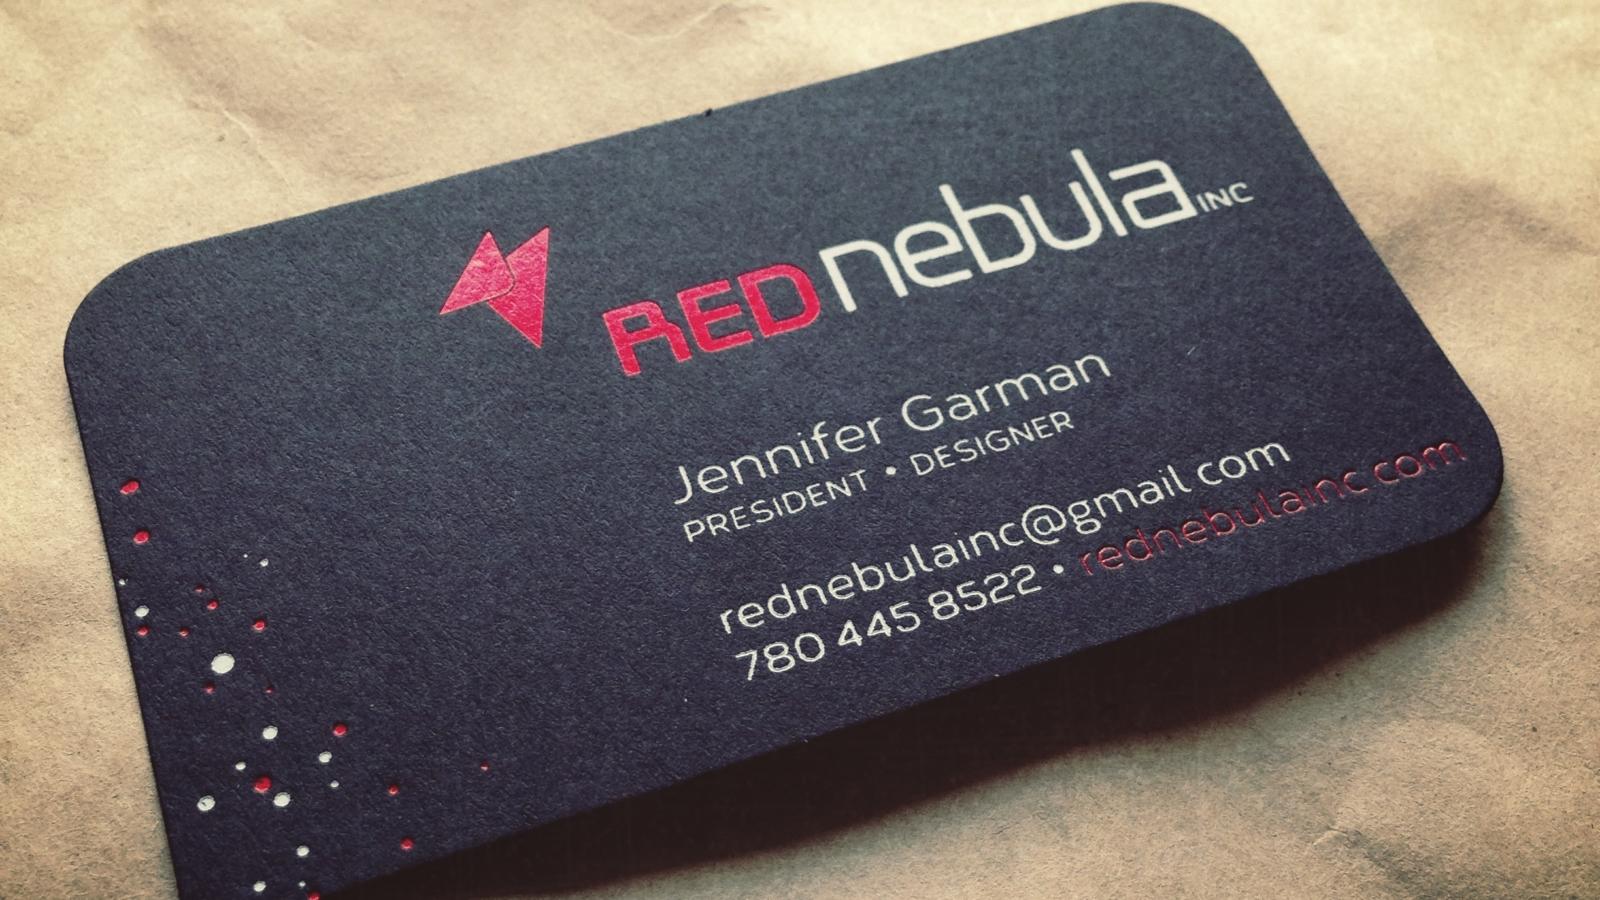 Red Nebula Inc. Business Card Design